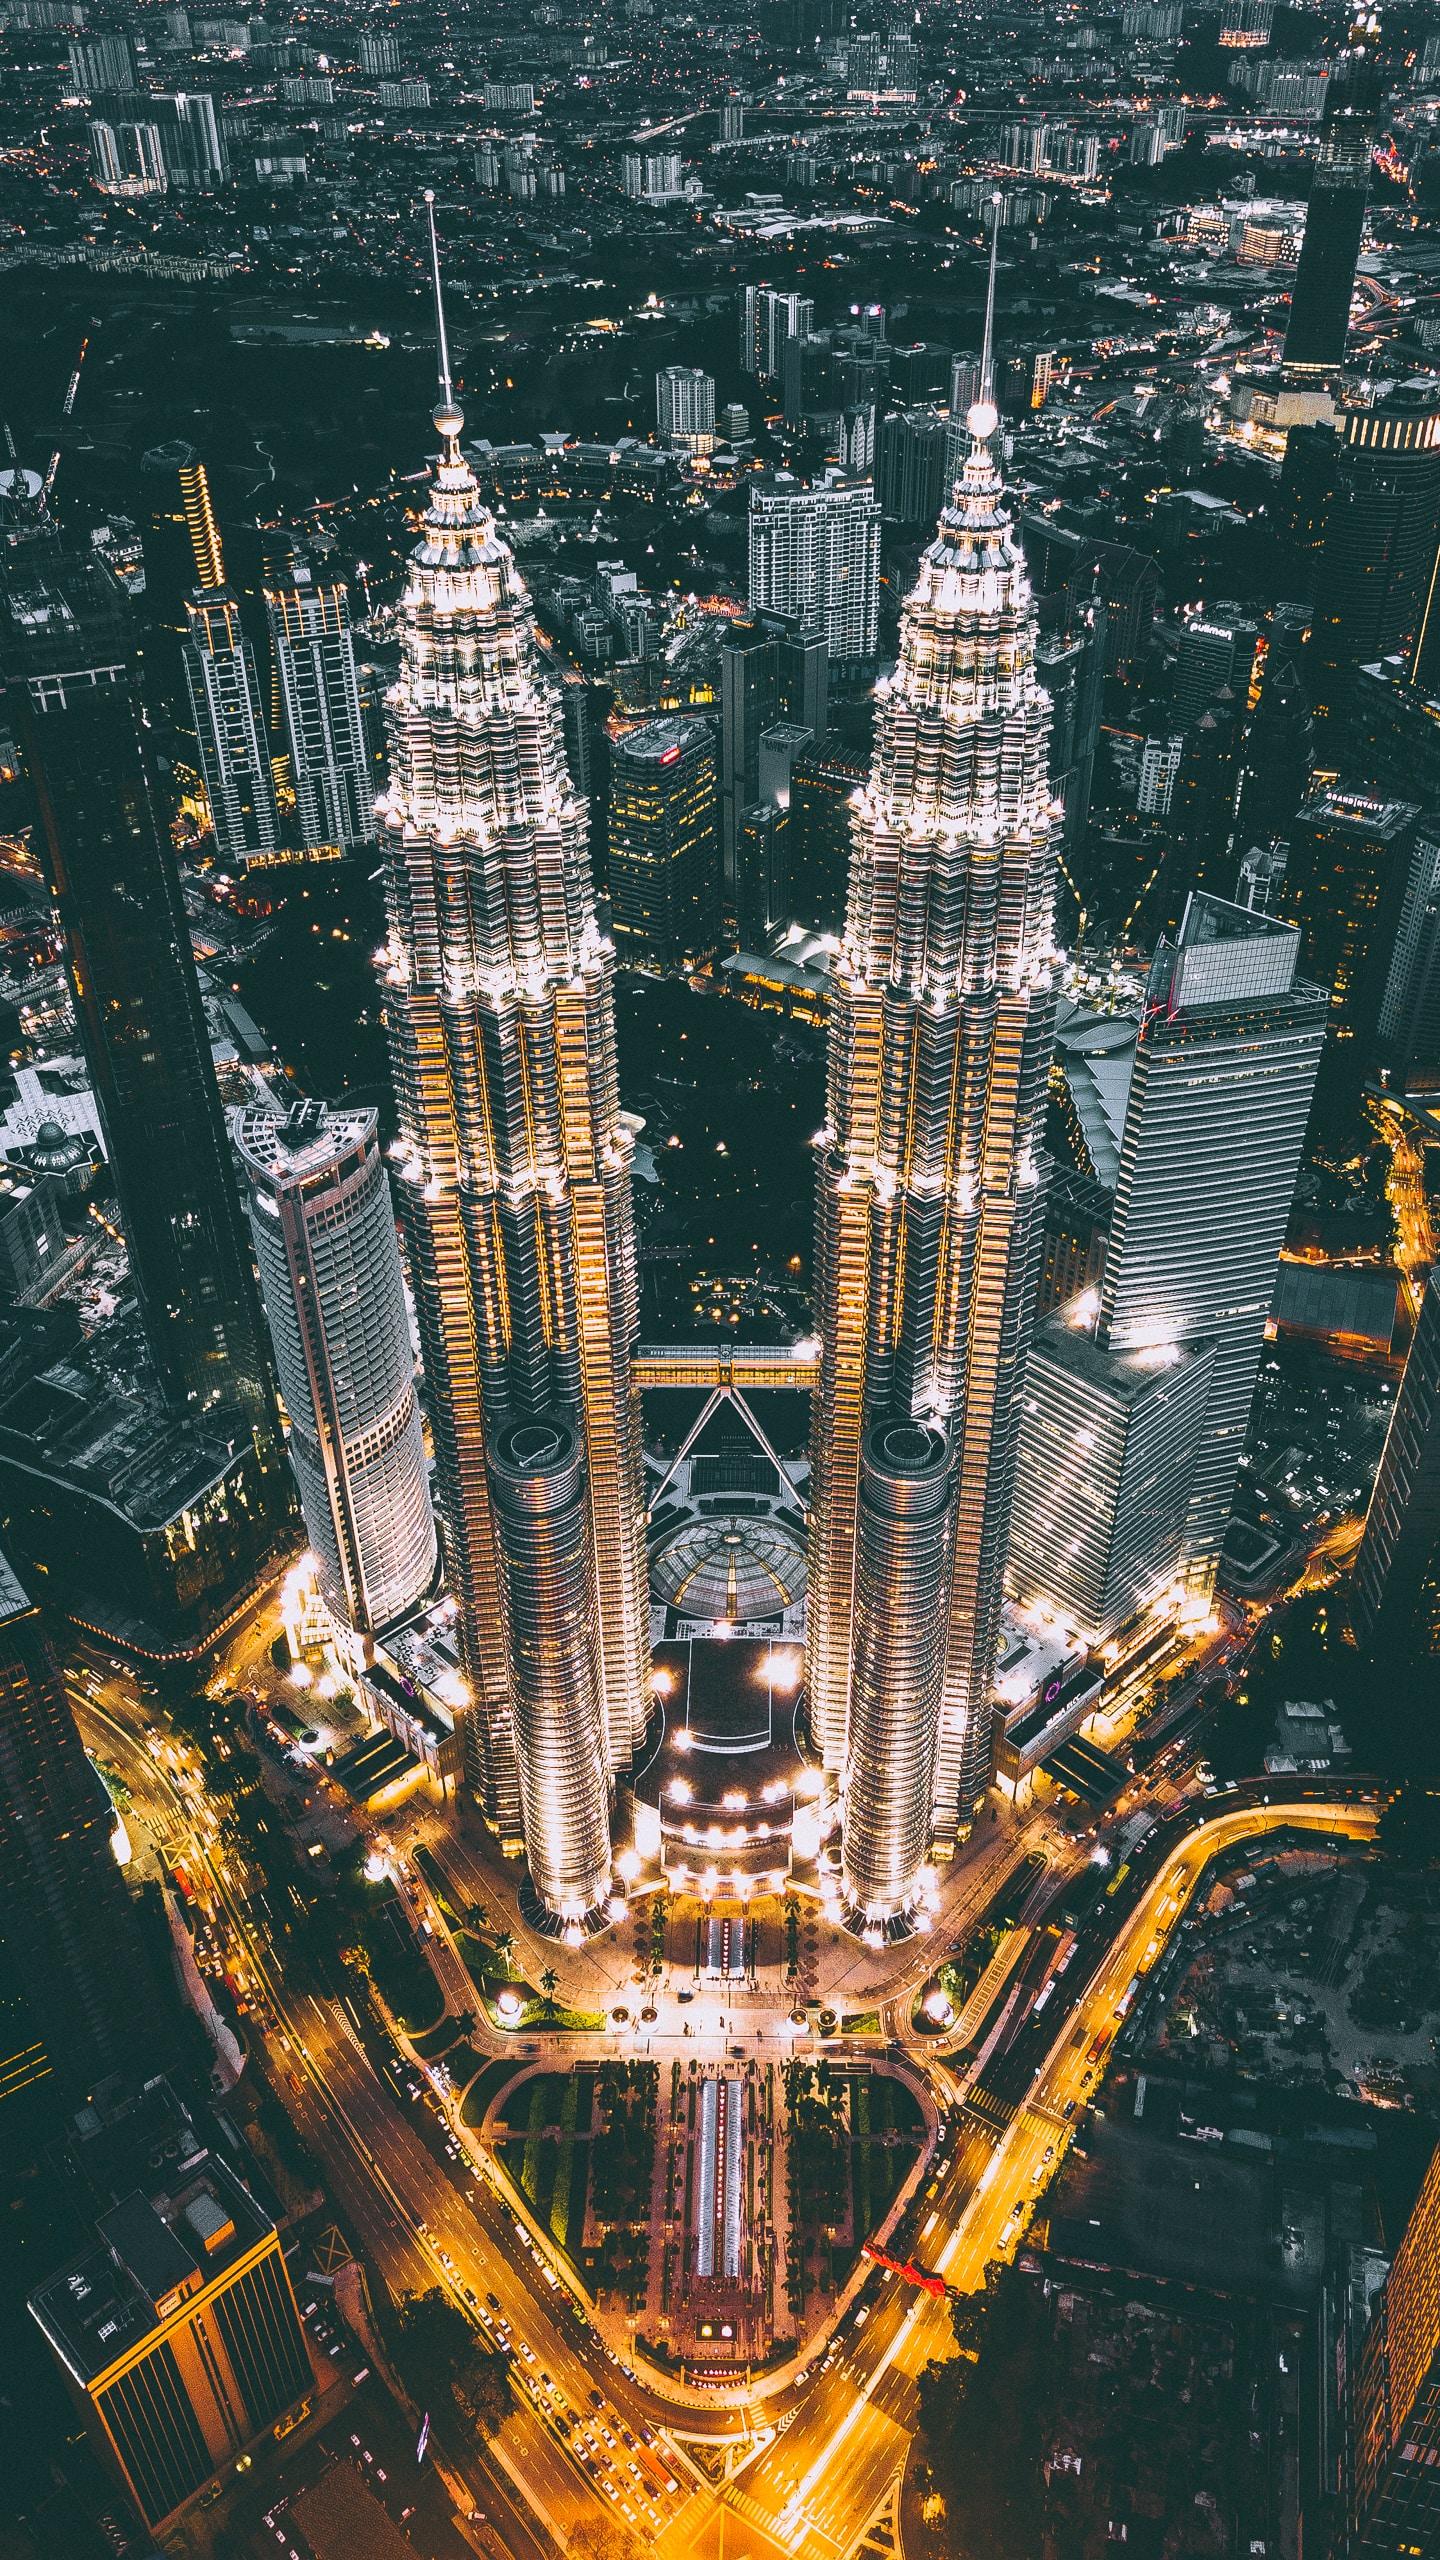 izuddin helmi adnan 1e71PSox7m8 unsplash - Malaysia Property Is Gold